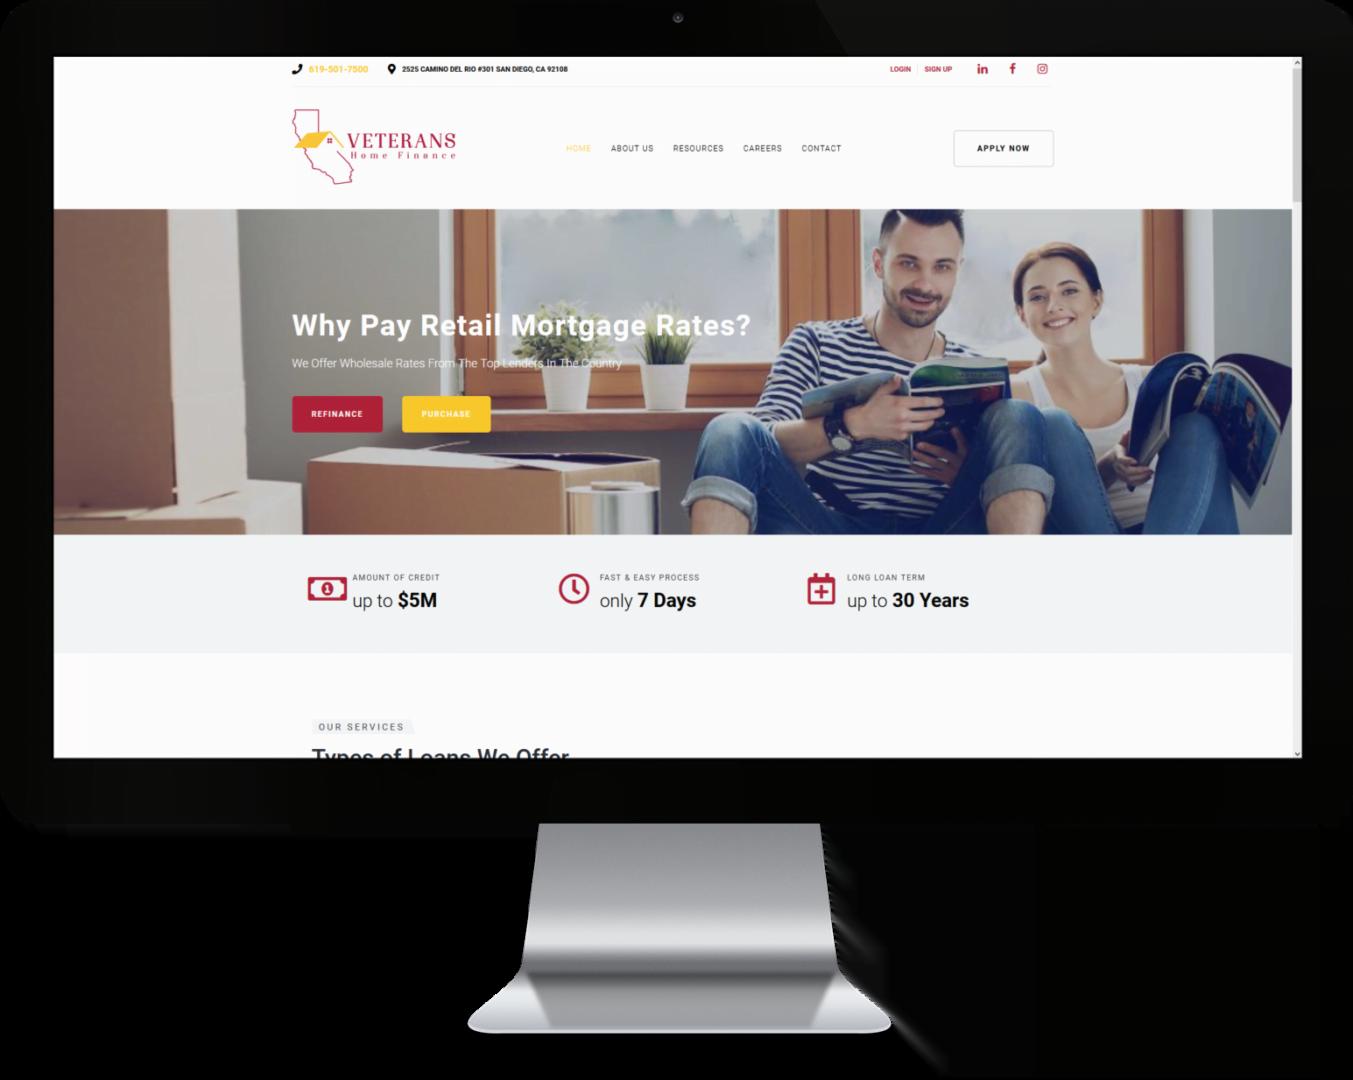 California Home Finance Custom Mortgage Website Design by CHEM.digital